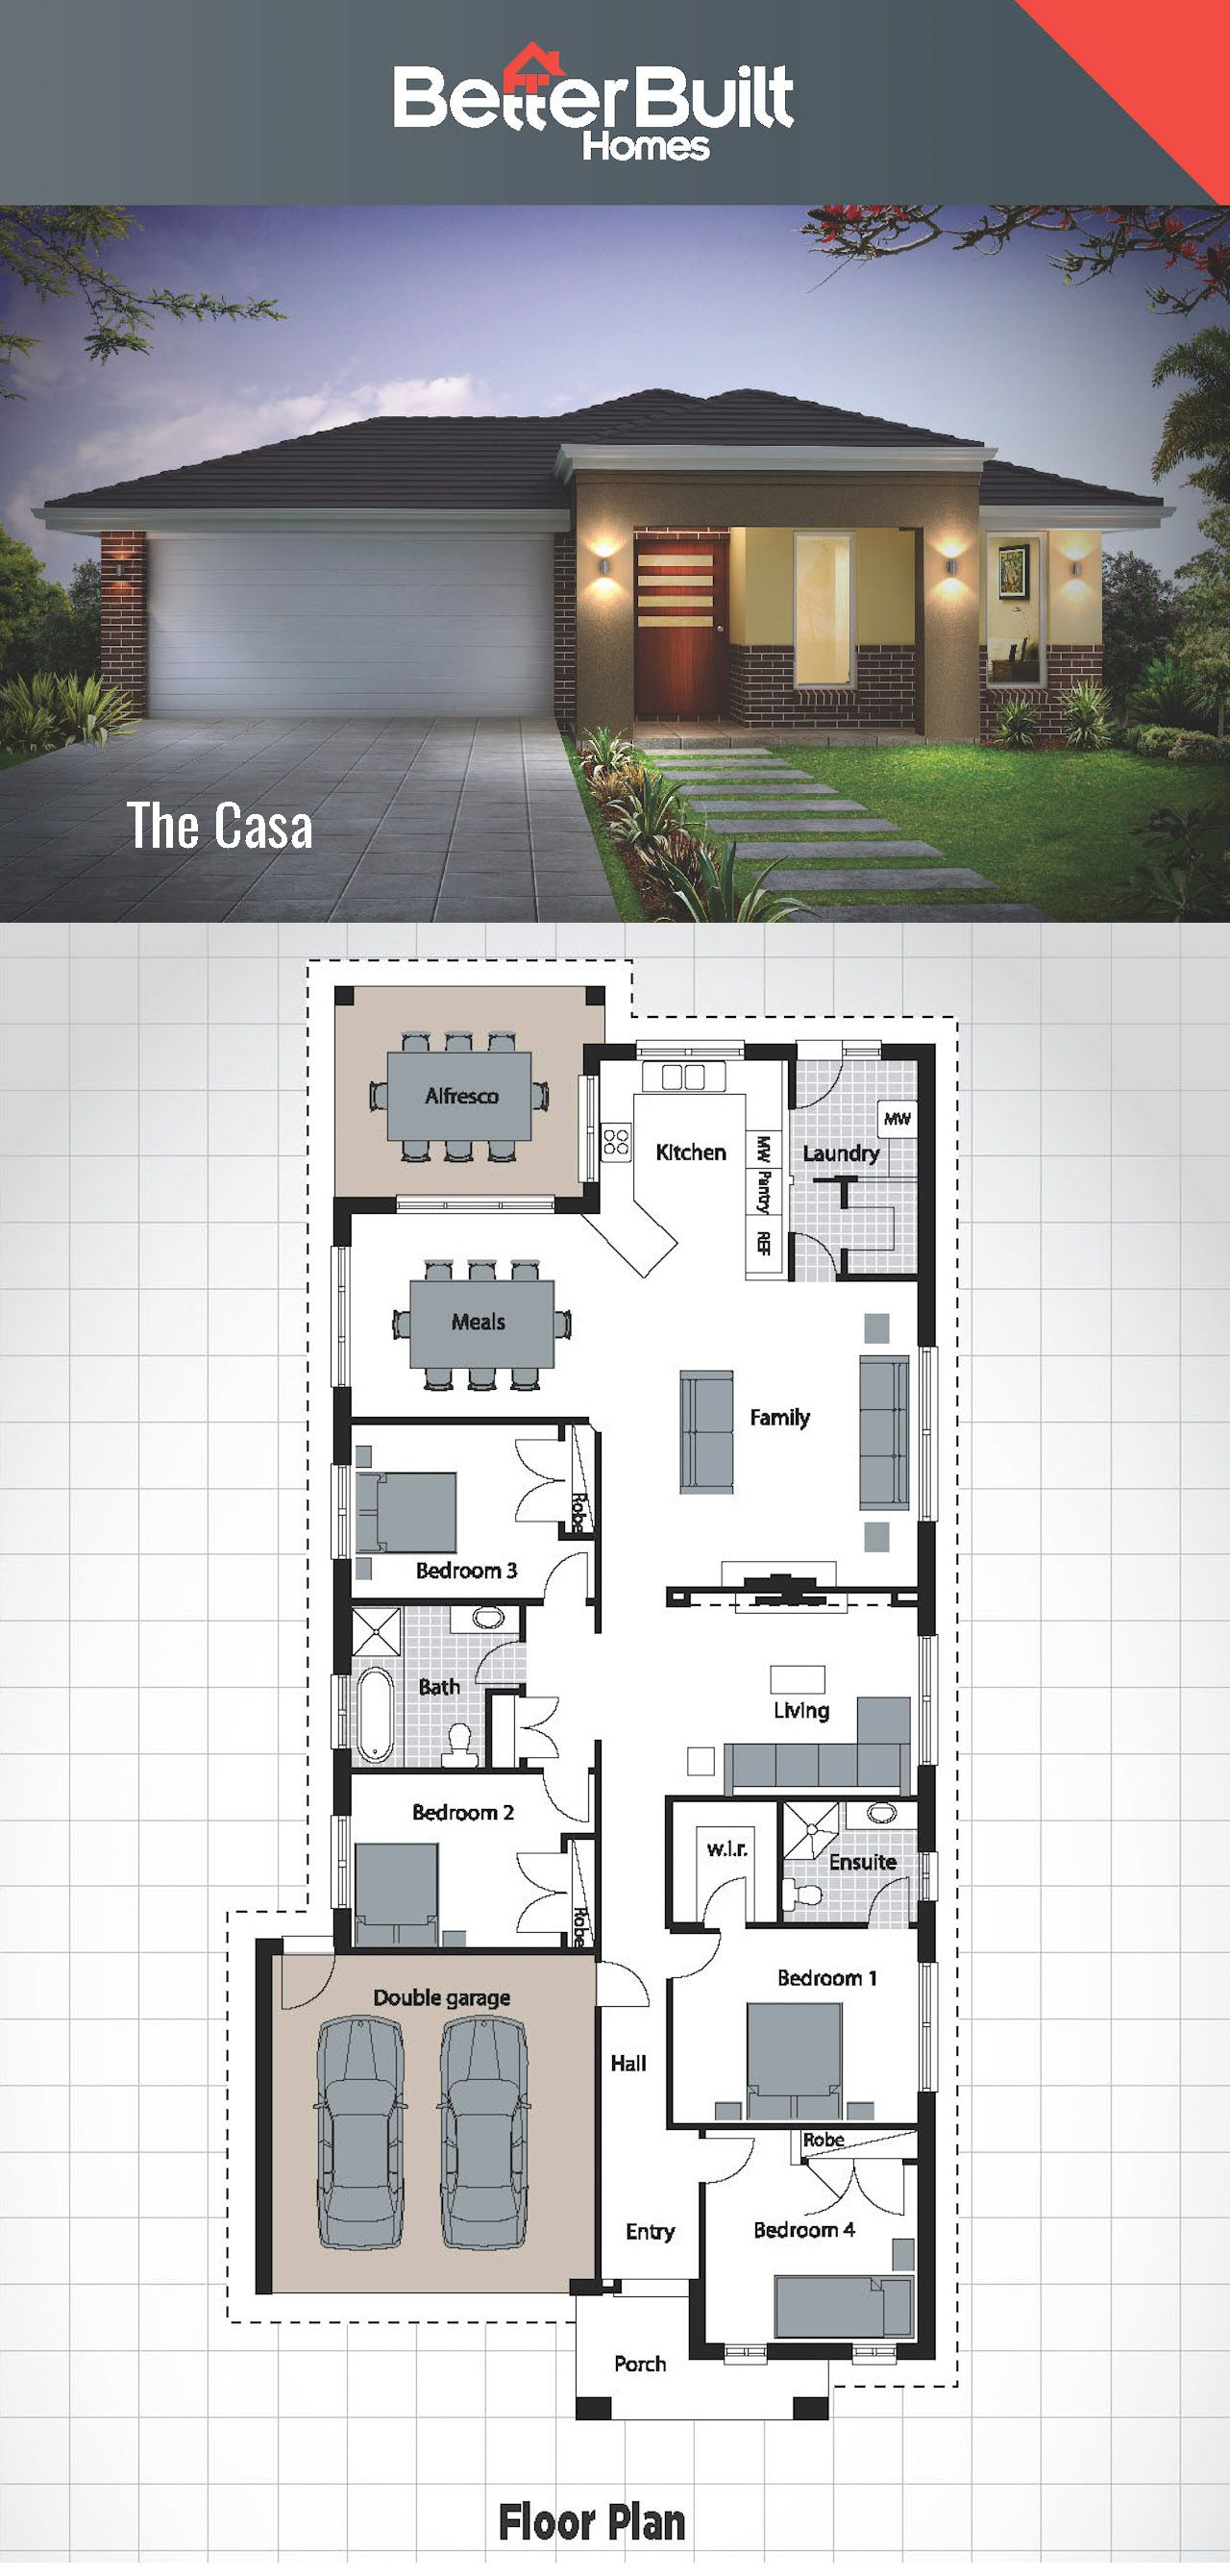 Casa House Design. Single Storey Delight. #betterbuilt